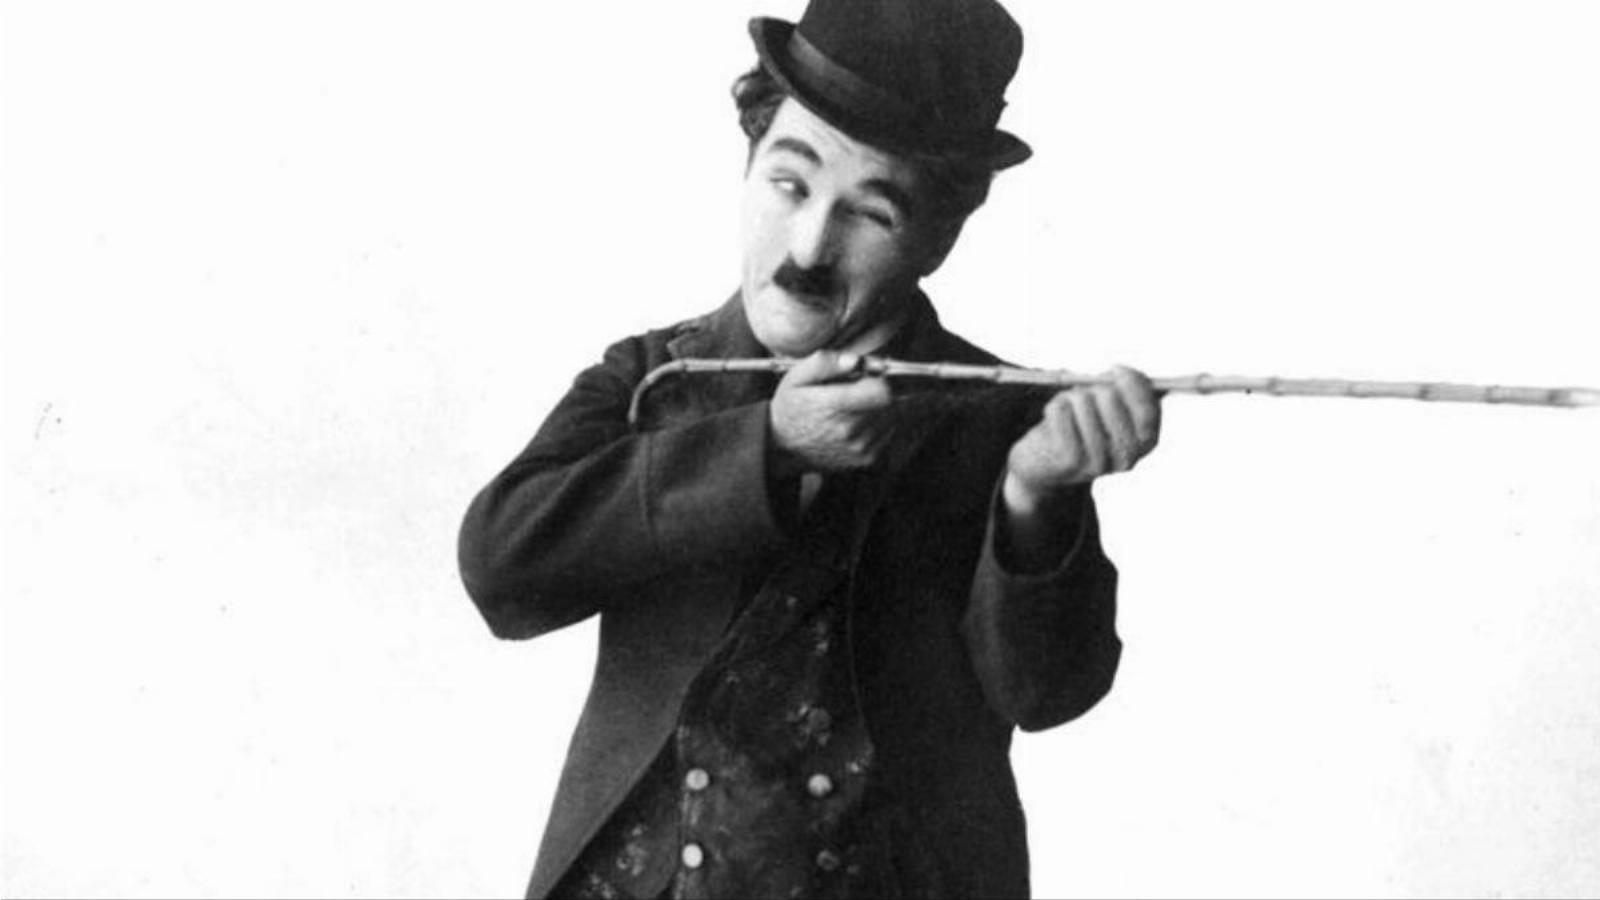 زادروز چارلی چاپلین، کمدین بزرگ تاریخ: سال 1889